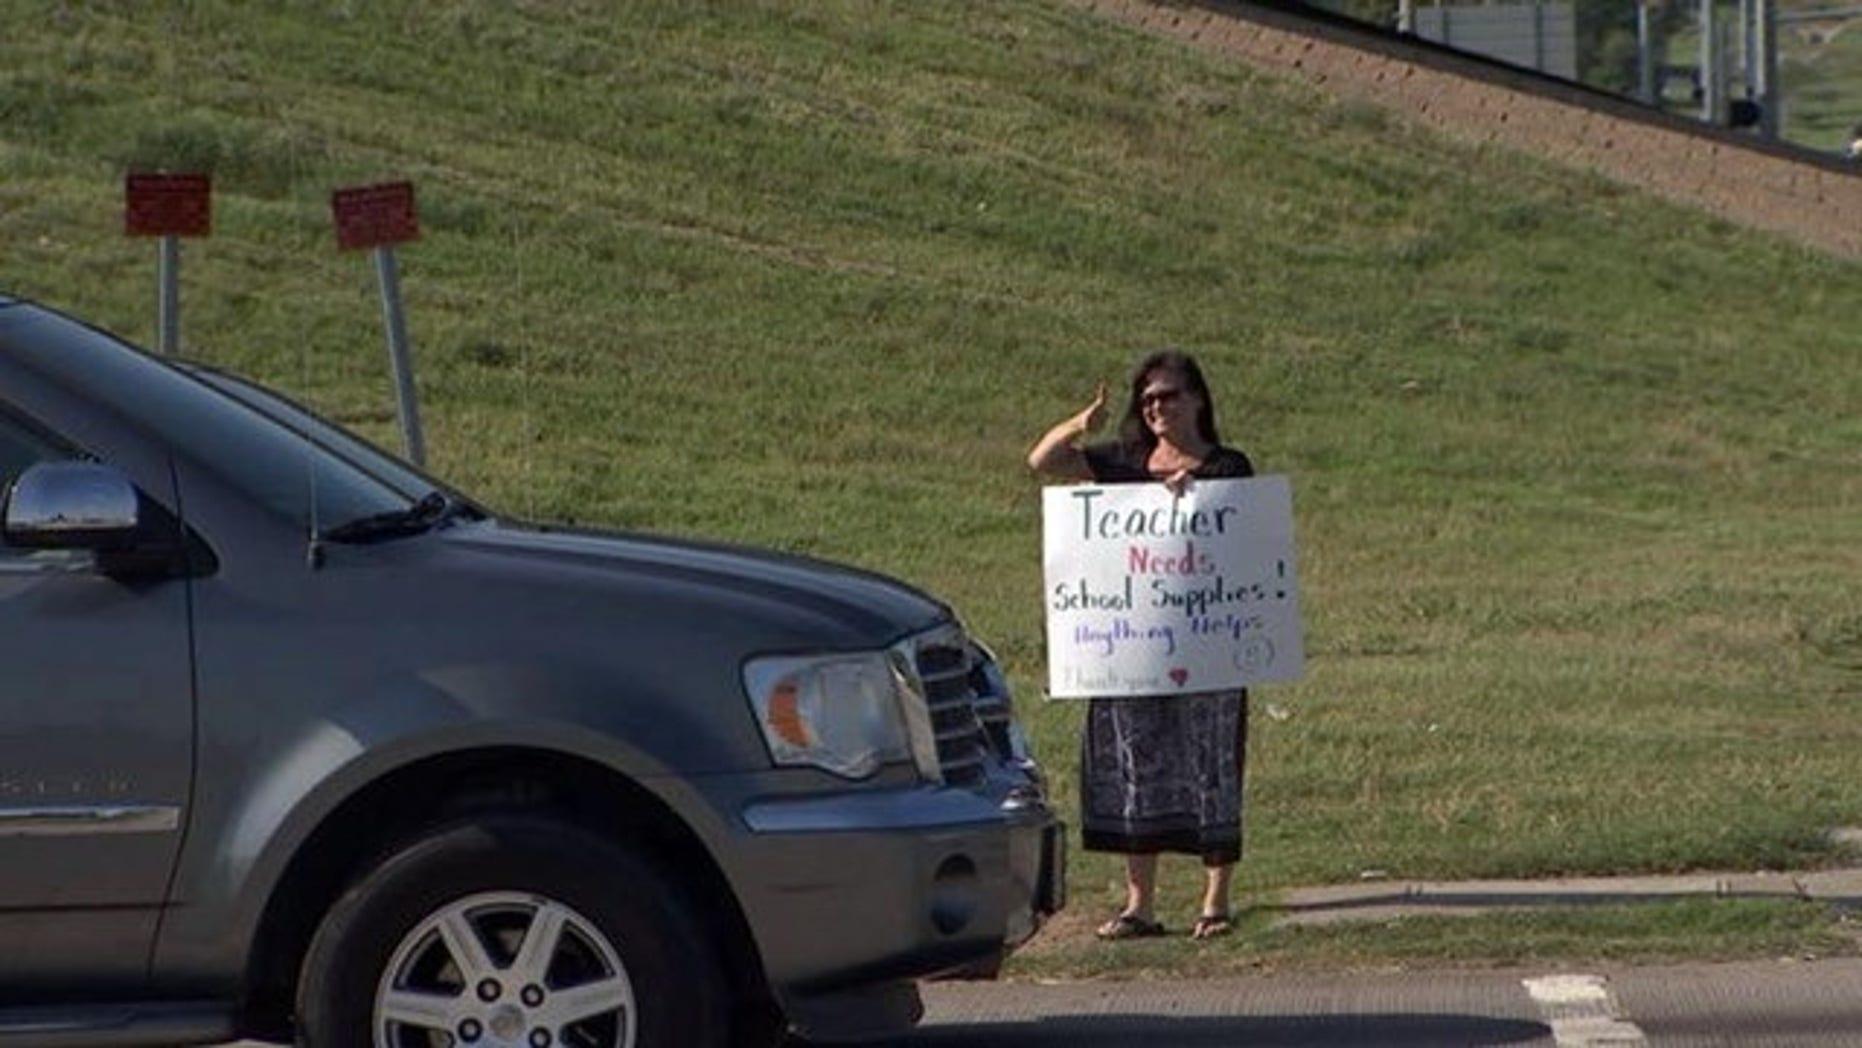 Tulsa, Okla., third-grade teacher Teresa Danks took to panhandling in order to raise money to buy classroom supplies.